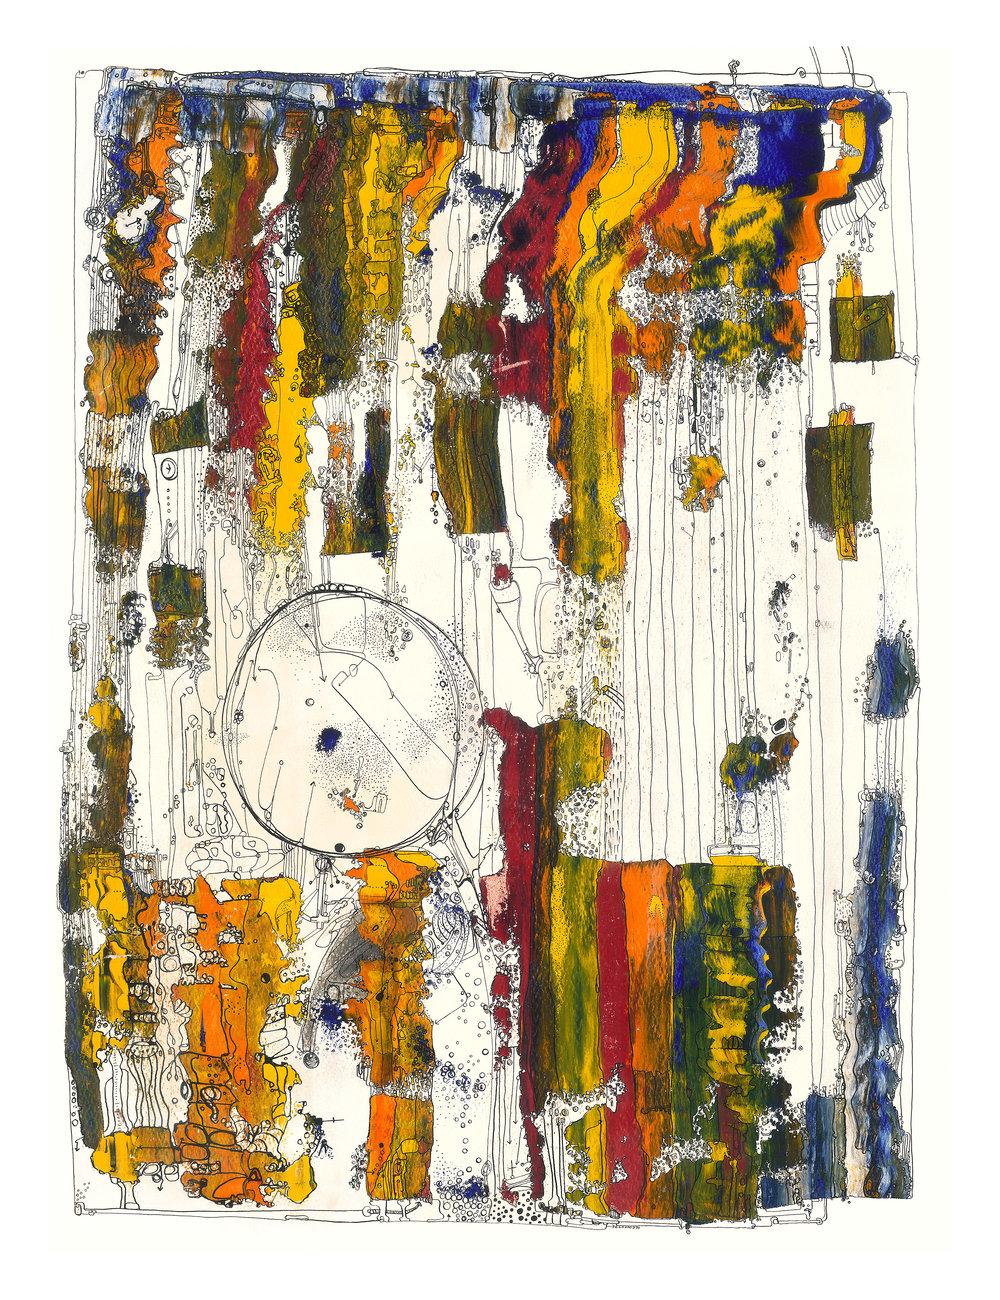 RogelioMaxwell-Propagation of Sound - 1971 -ArchivalPigmentPrint- 30x40-$1500.jpeg